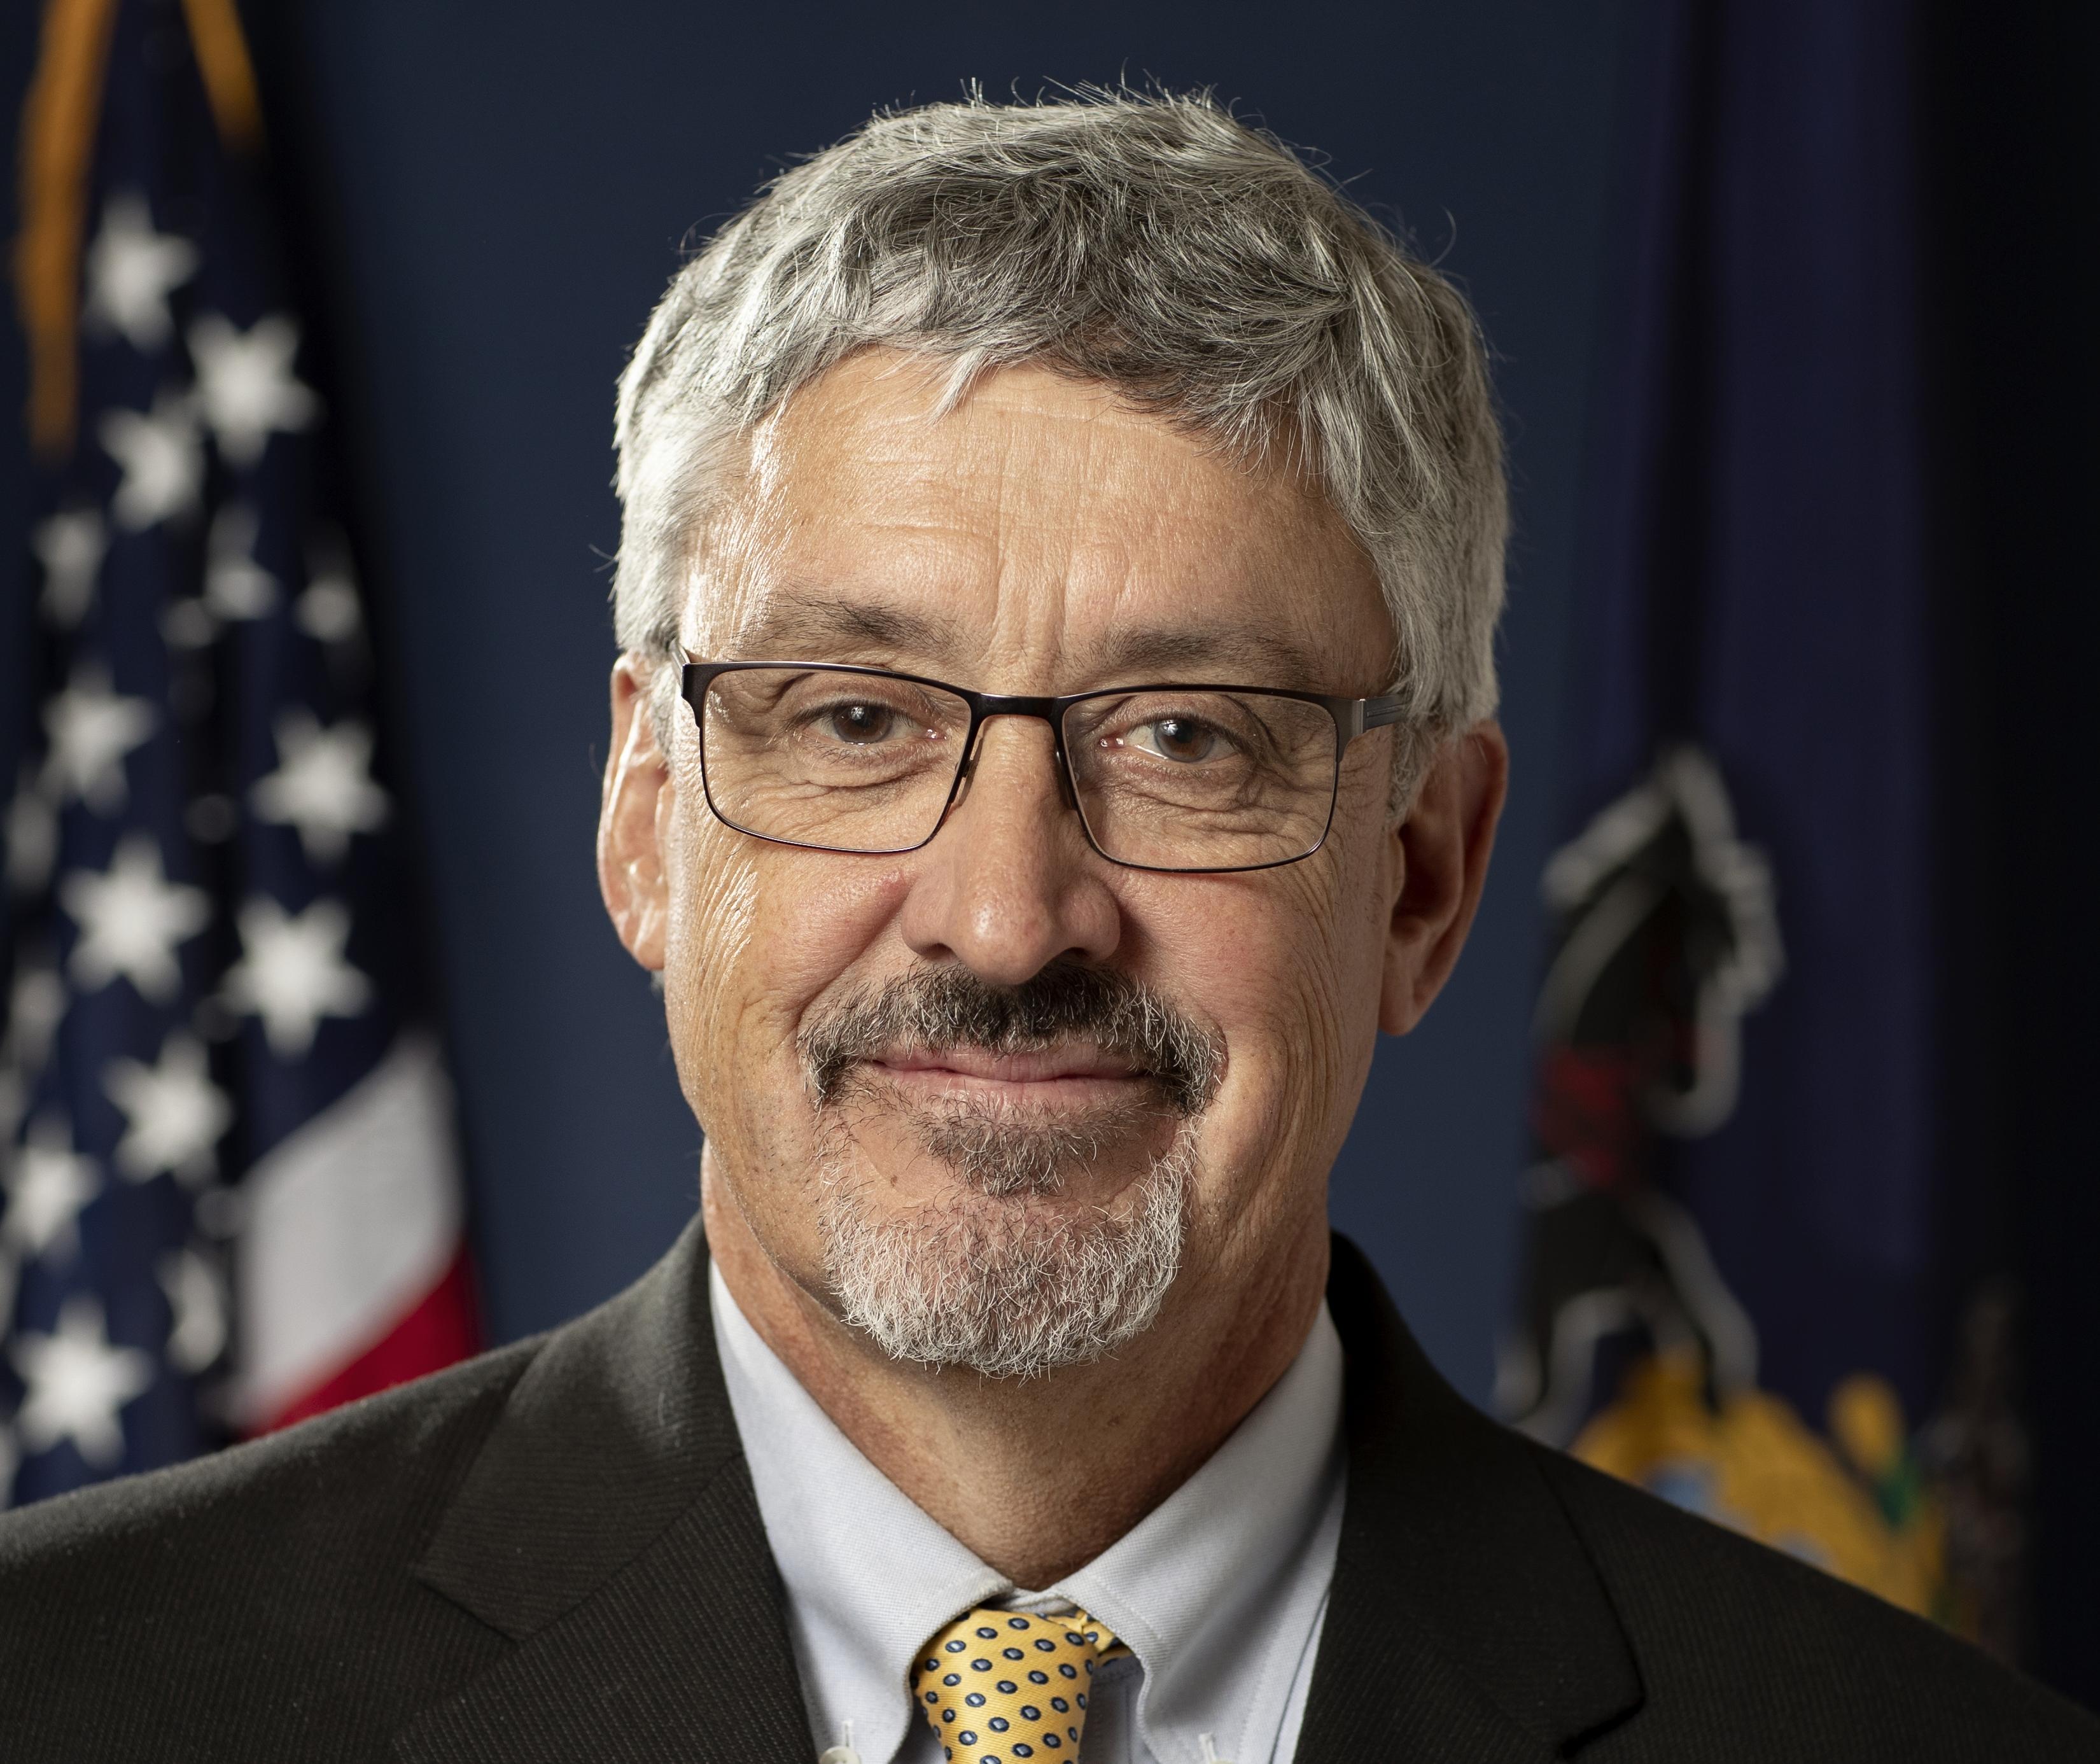 Delaware County Leadership: State Sen. Tim Kearney